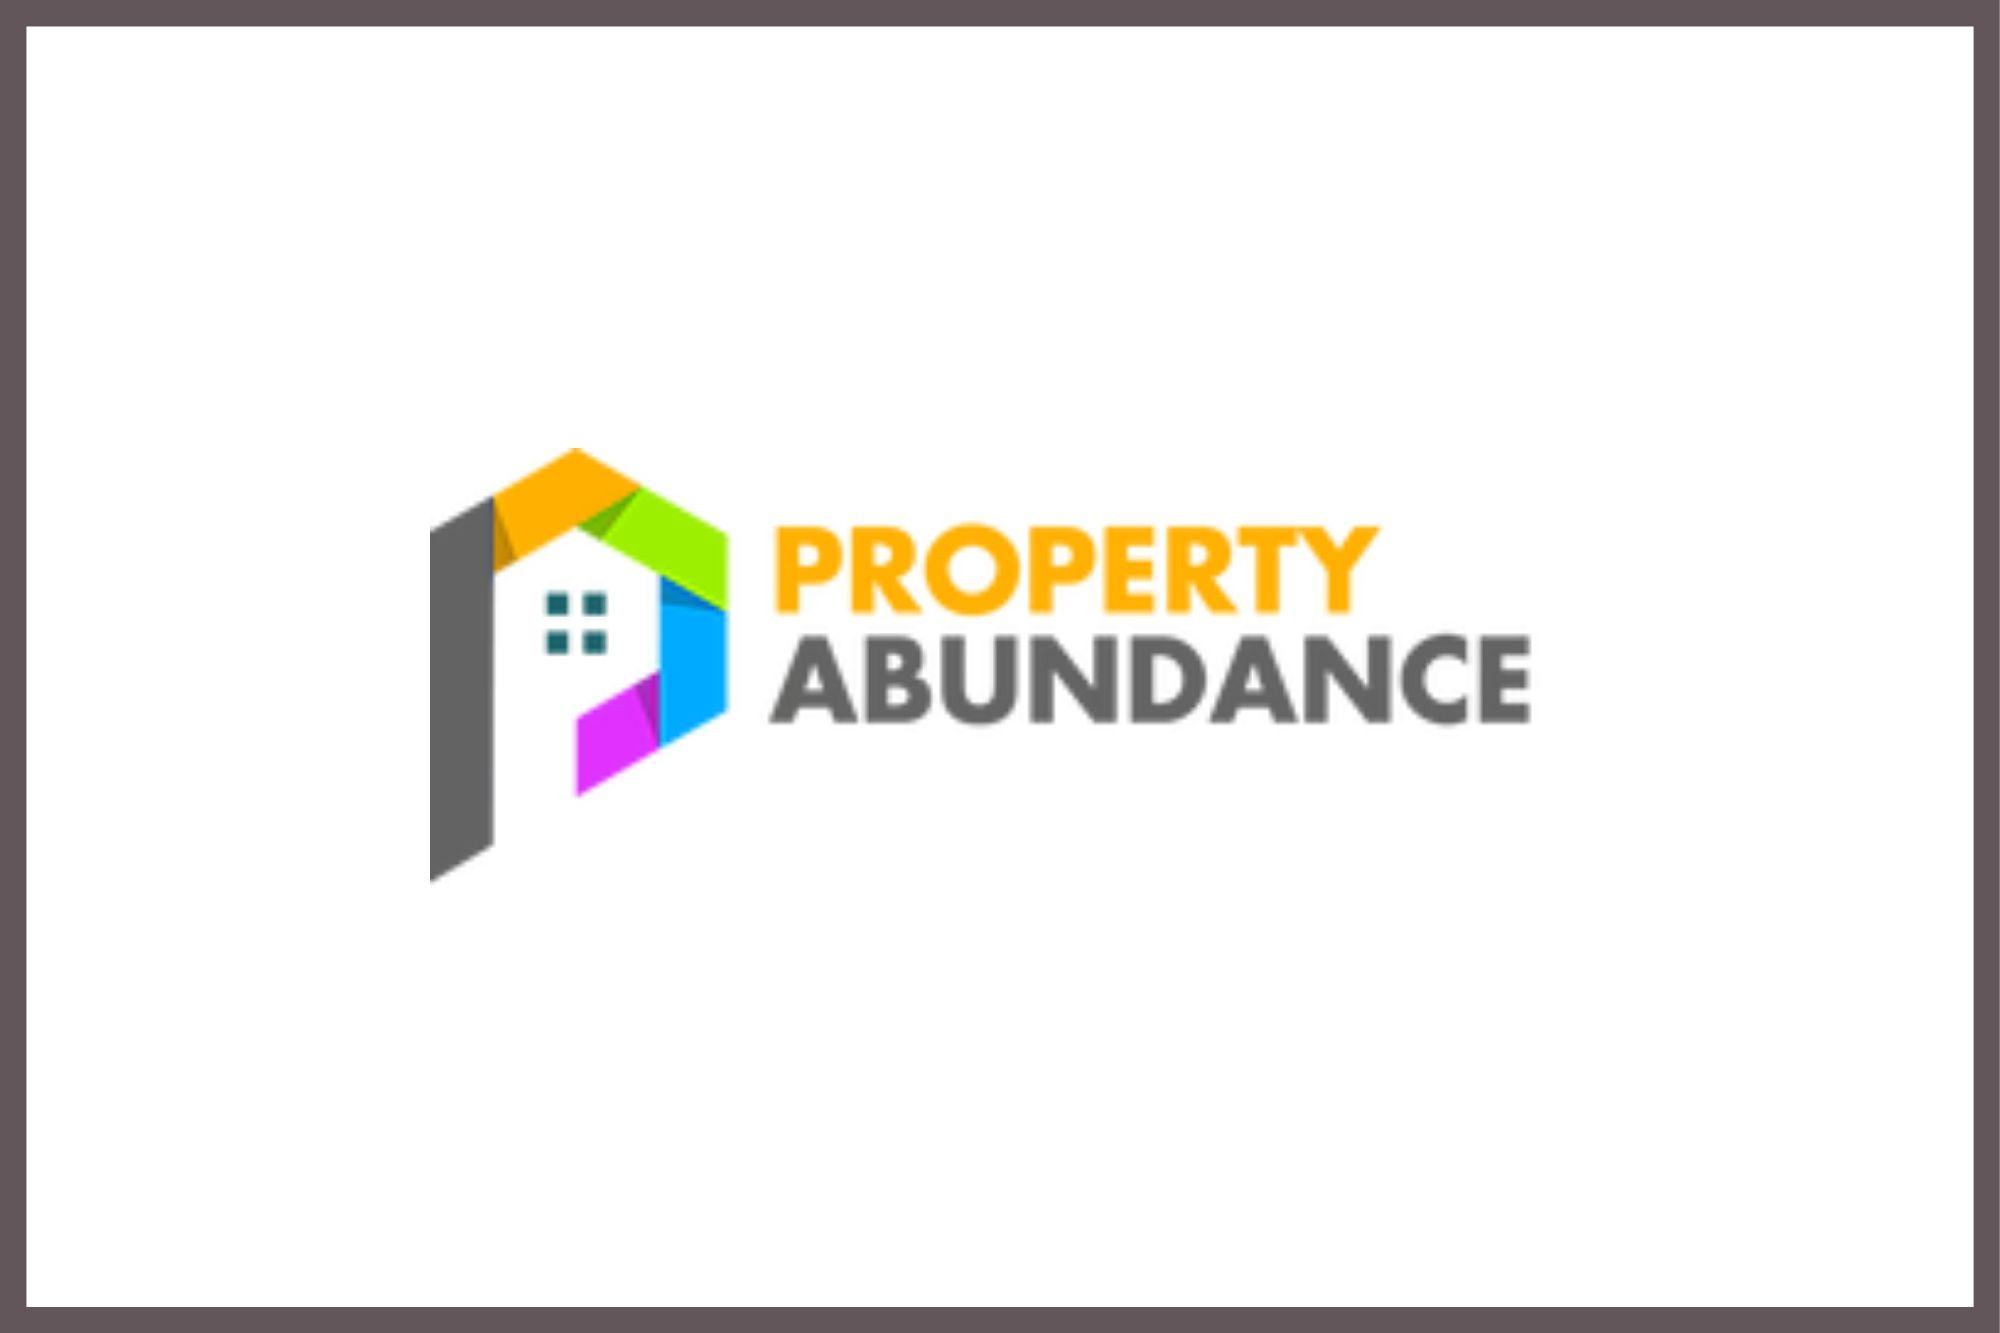 Property Abundance2